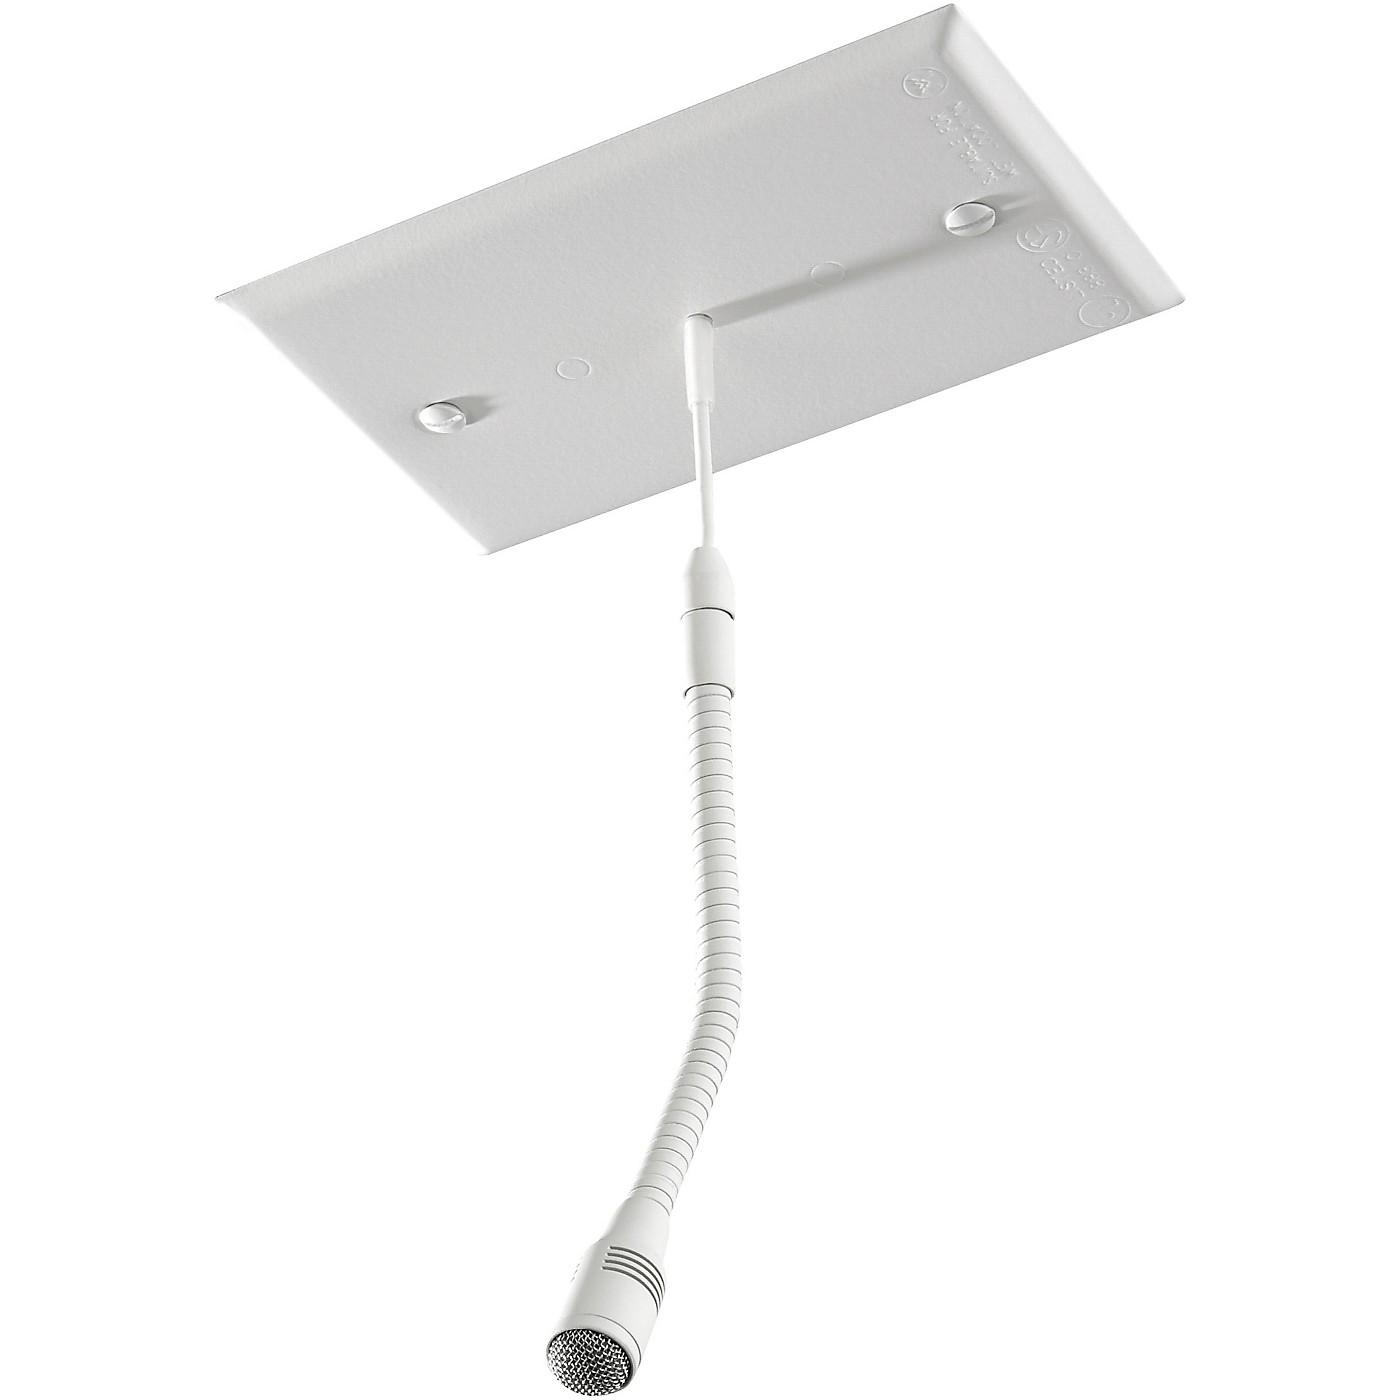 Beyerdynamic OM 304 US - Gooseneck Microphone in White thumbnail